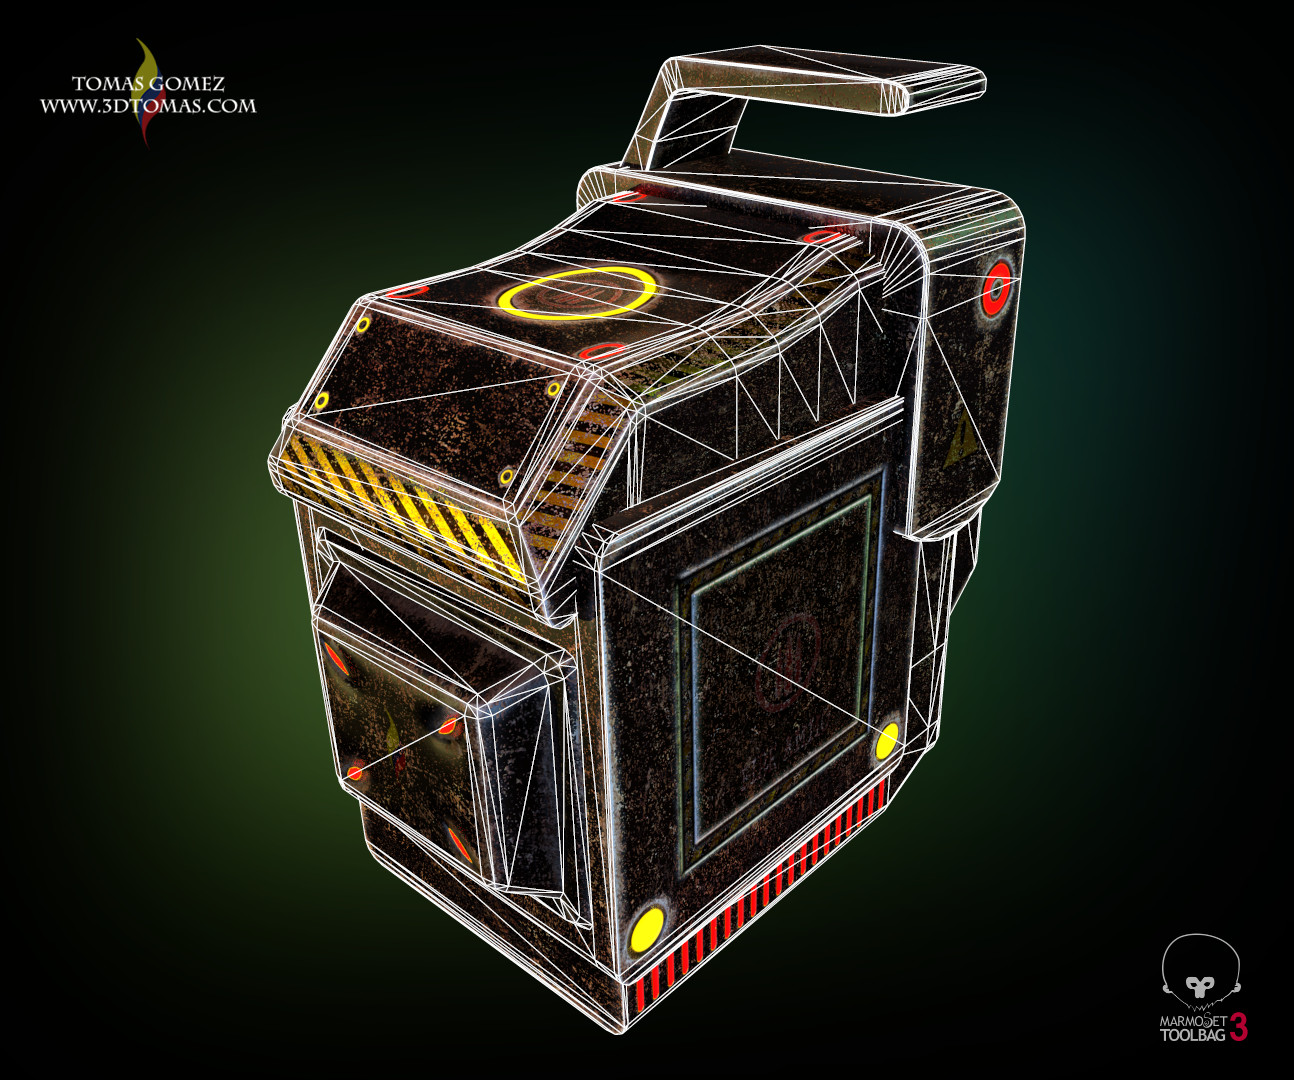 Tomas gomez crate7